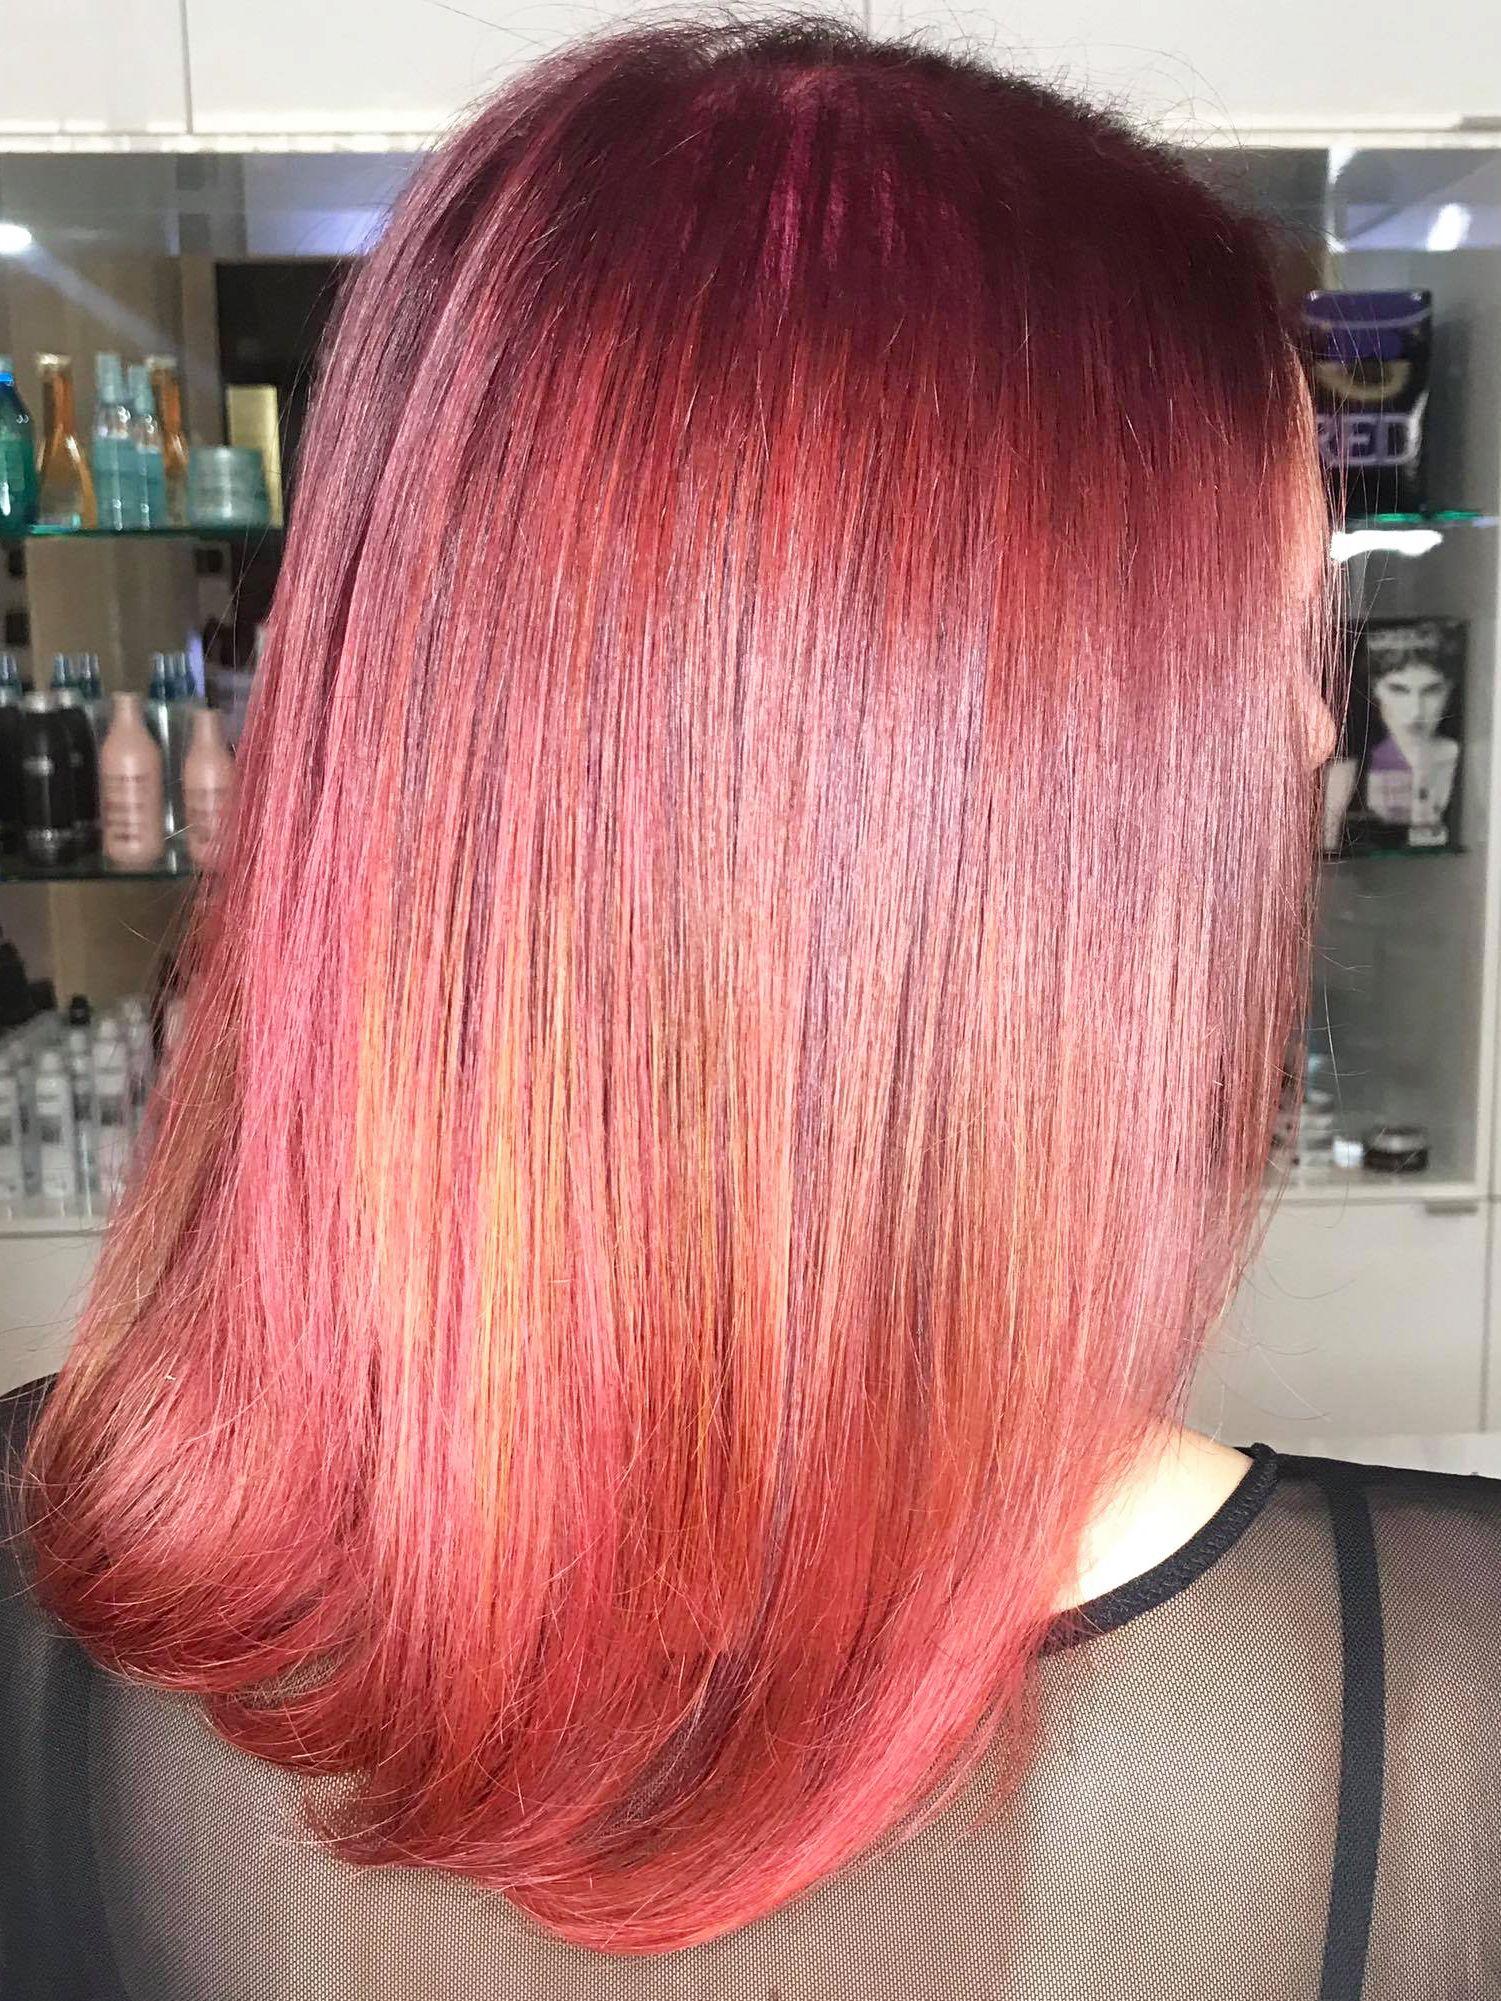 Hair Trends Pastel Friseur Berlin Haar Styling Langhaarfrisuren